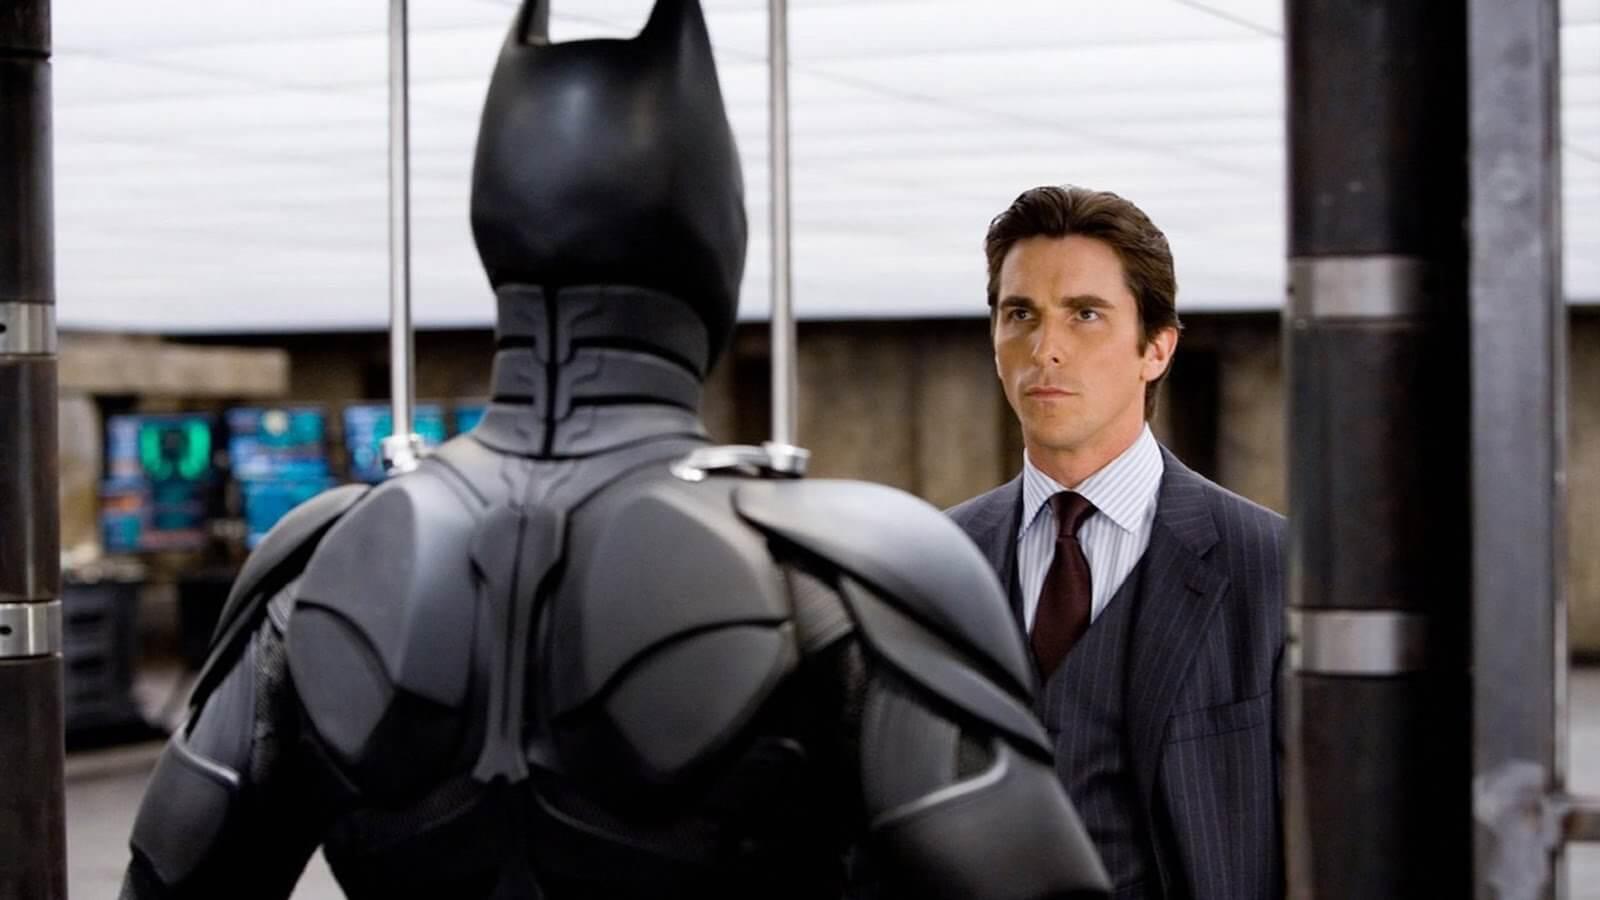 How to Write a Story Outline - Free Script Template - Bruce Wayne Faces Batman